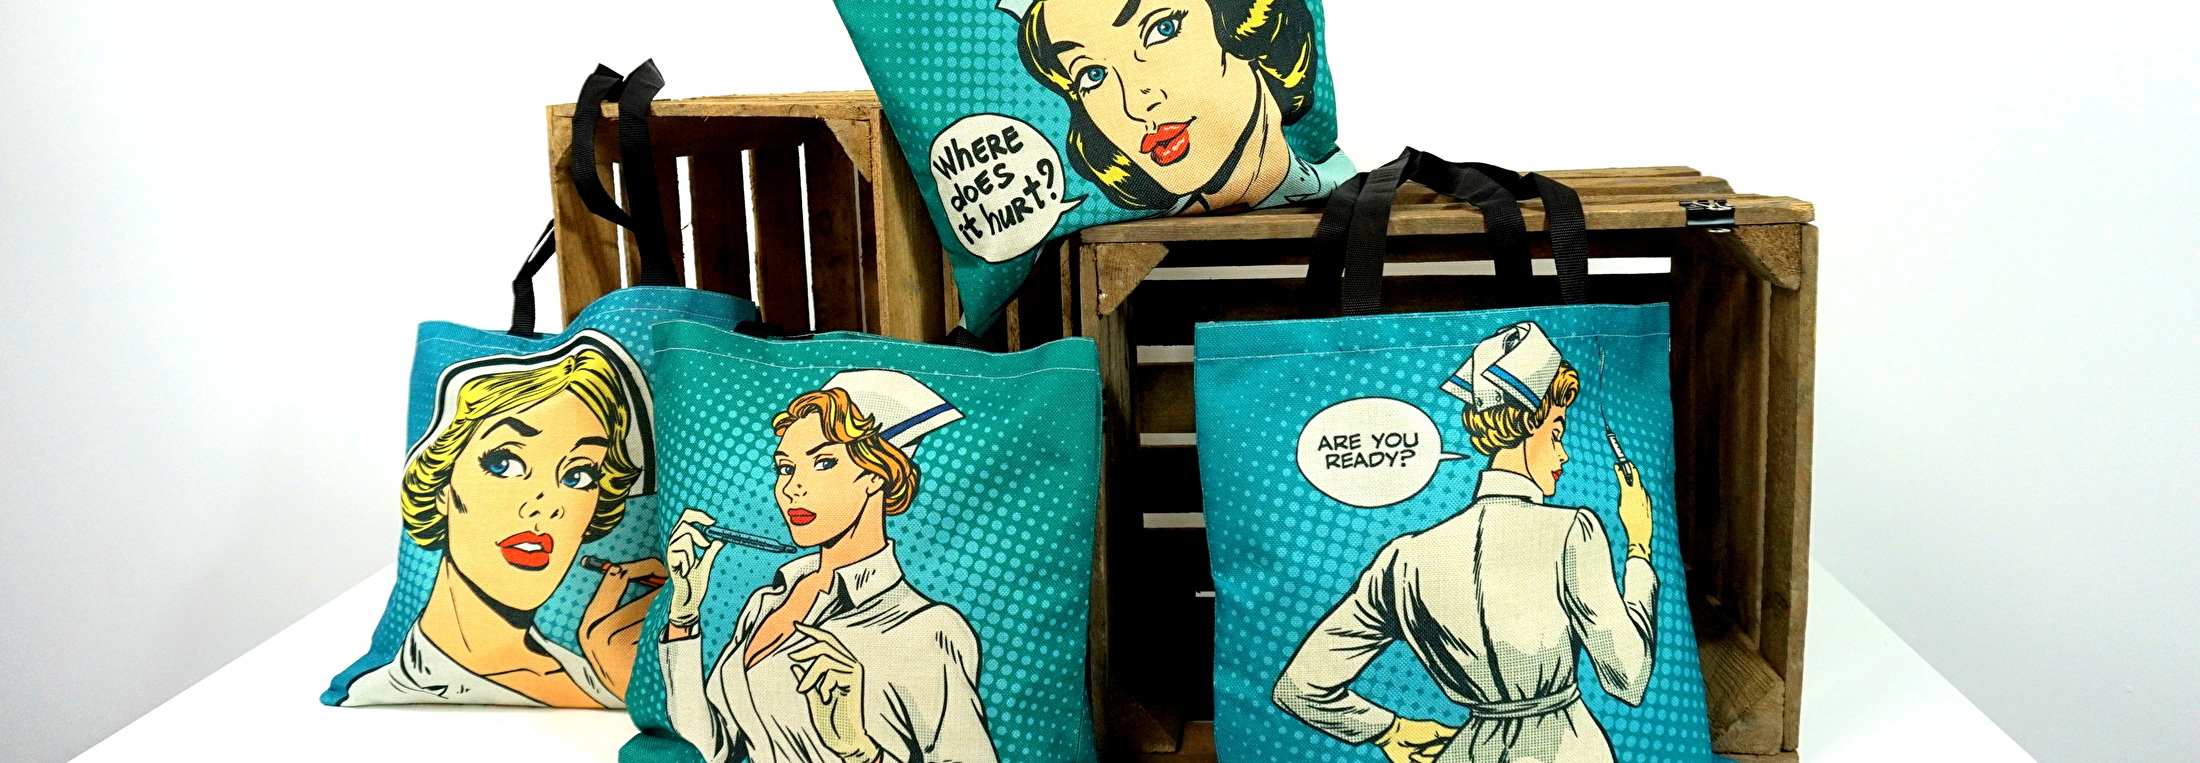 Verpleegkundige Tassen Pop-Art zuster